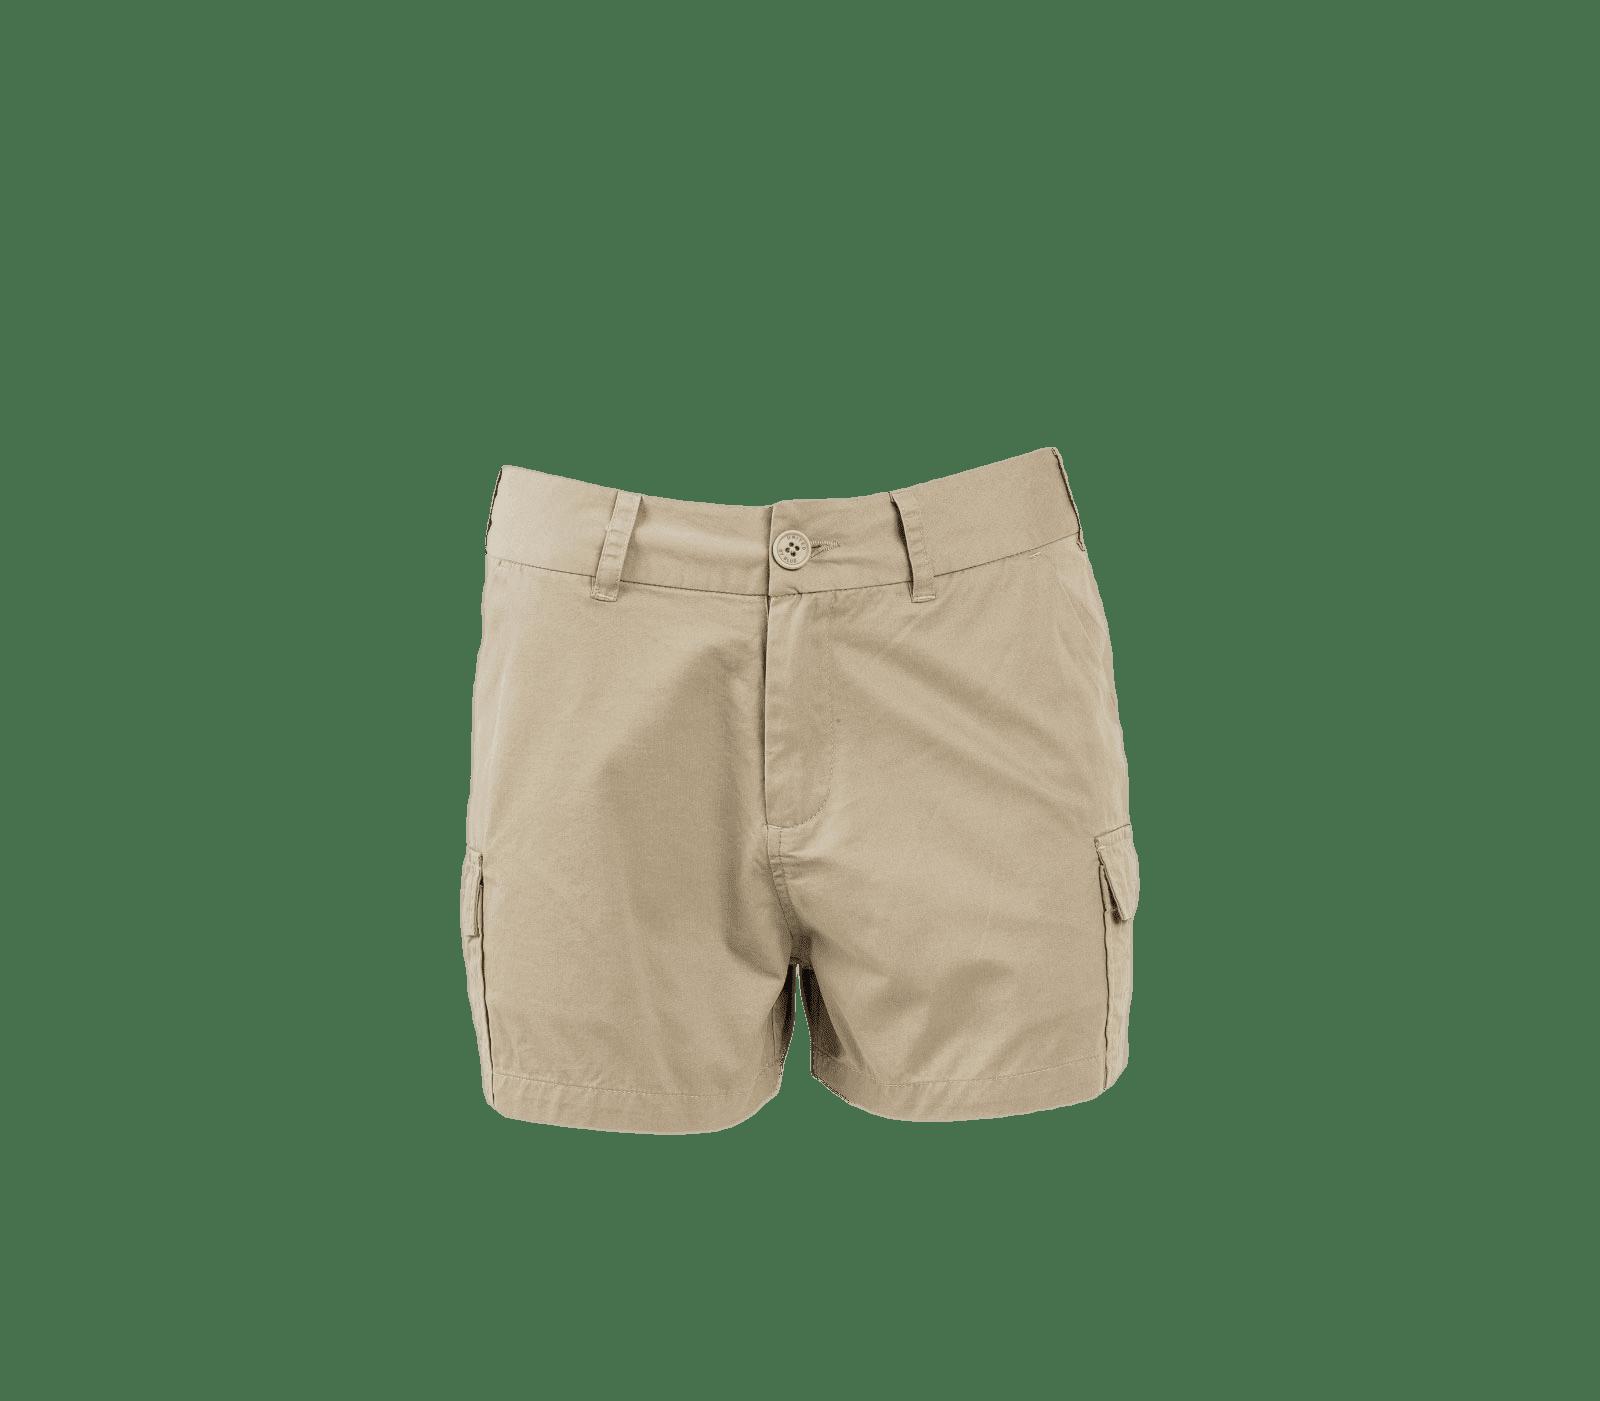 Short roan